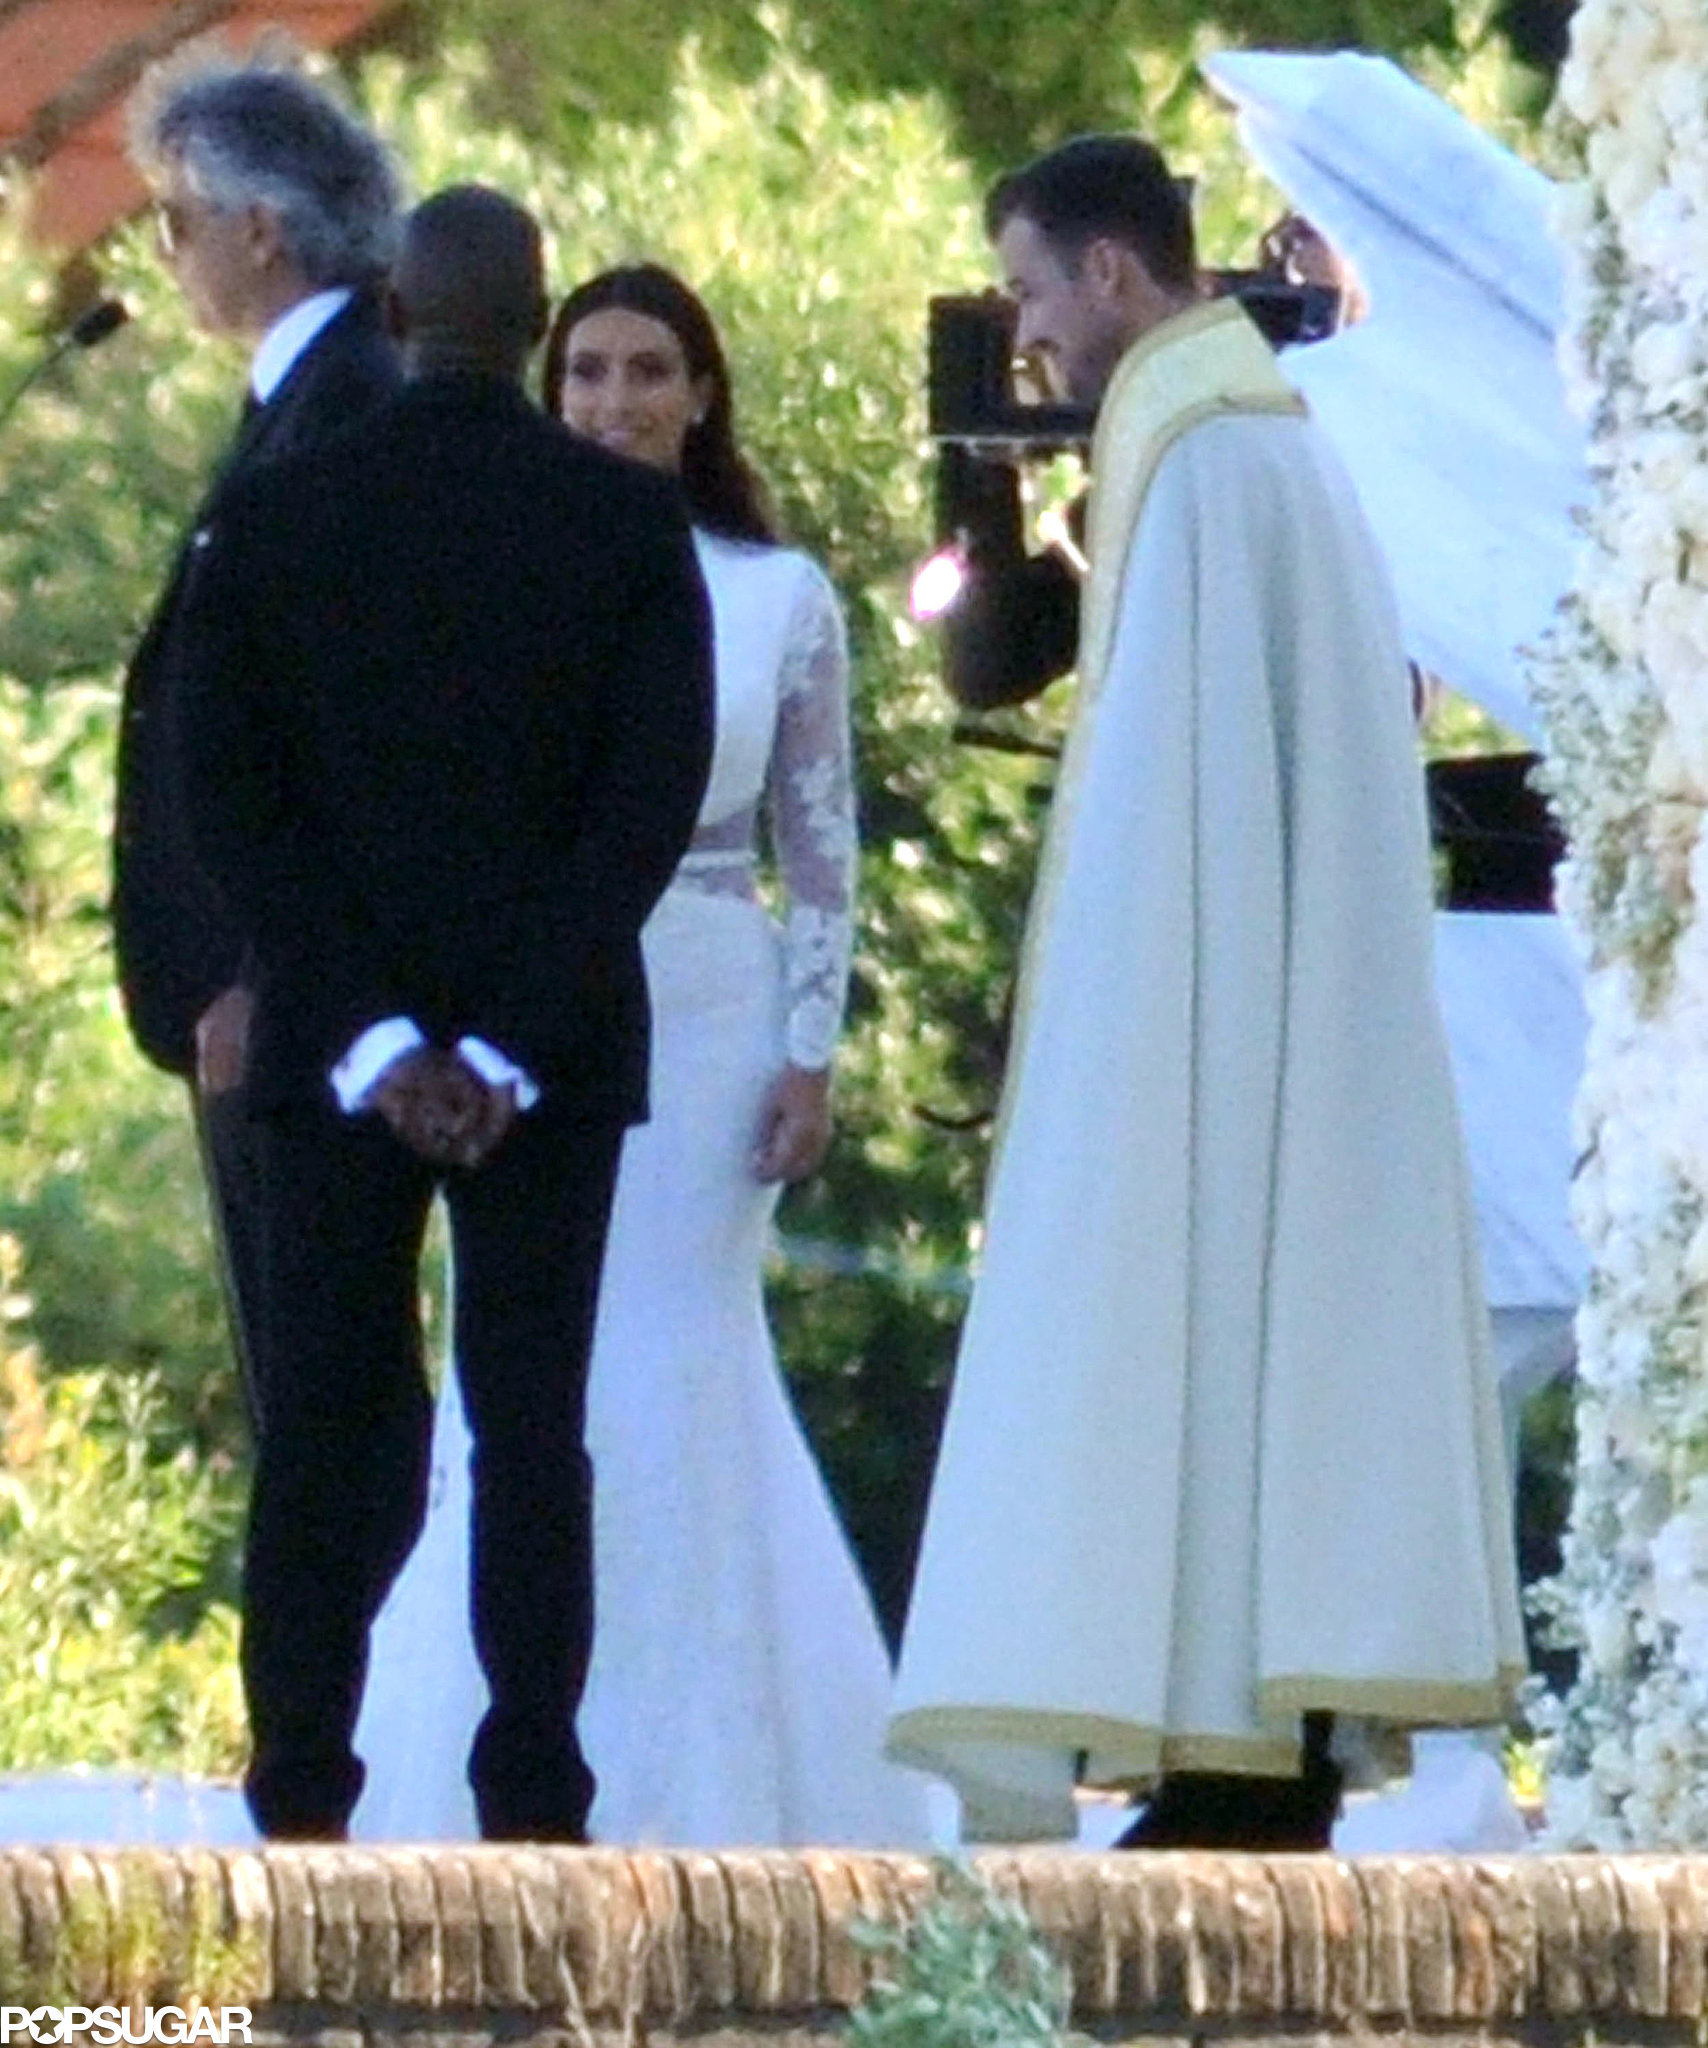 Wedding Dance At The Altar: Kim And Kanye Stood At The Altar.